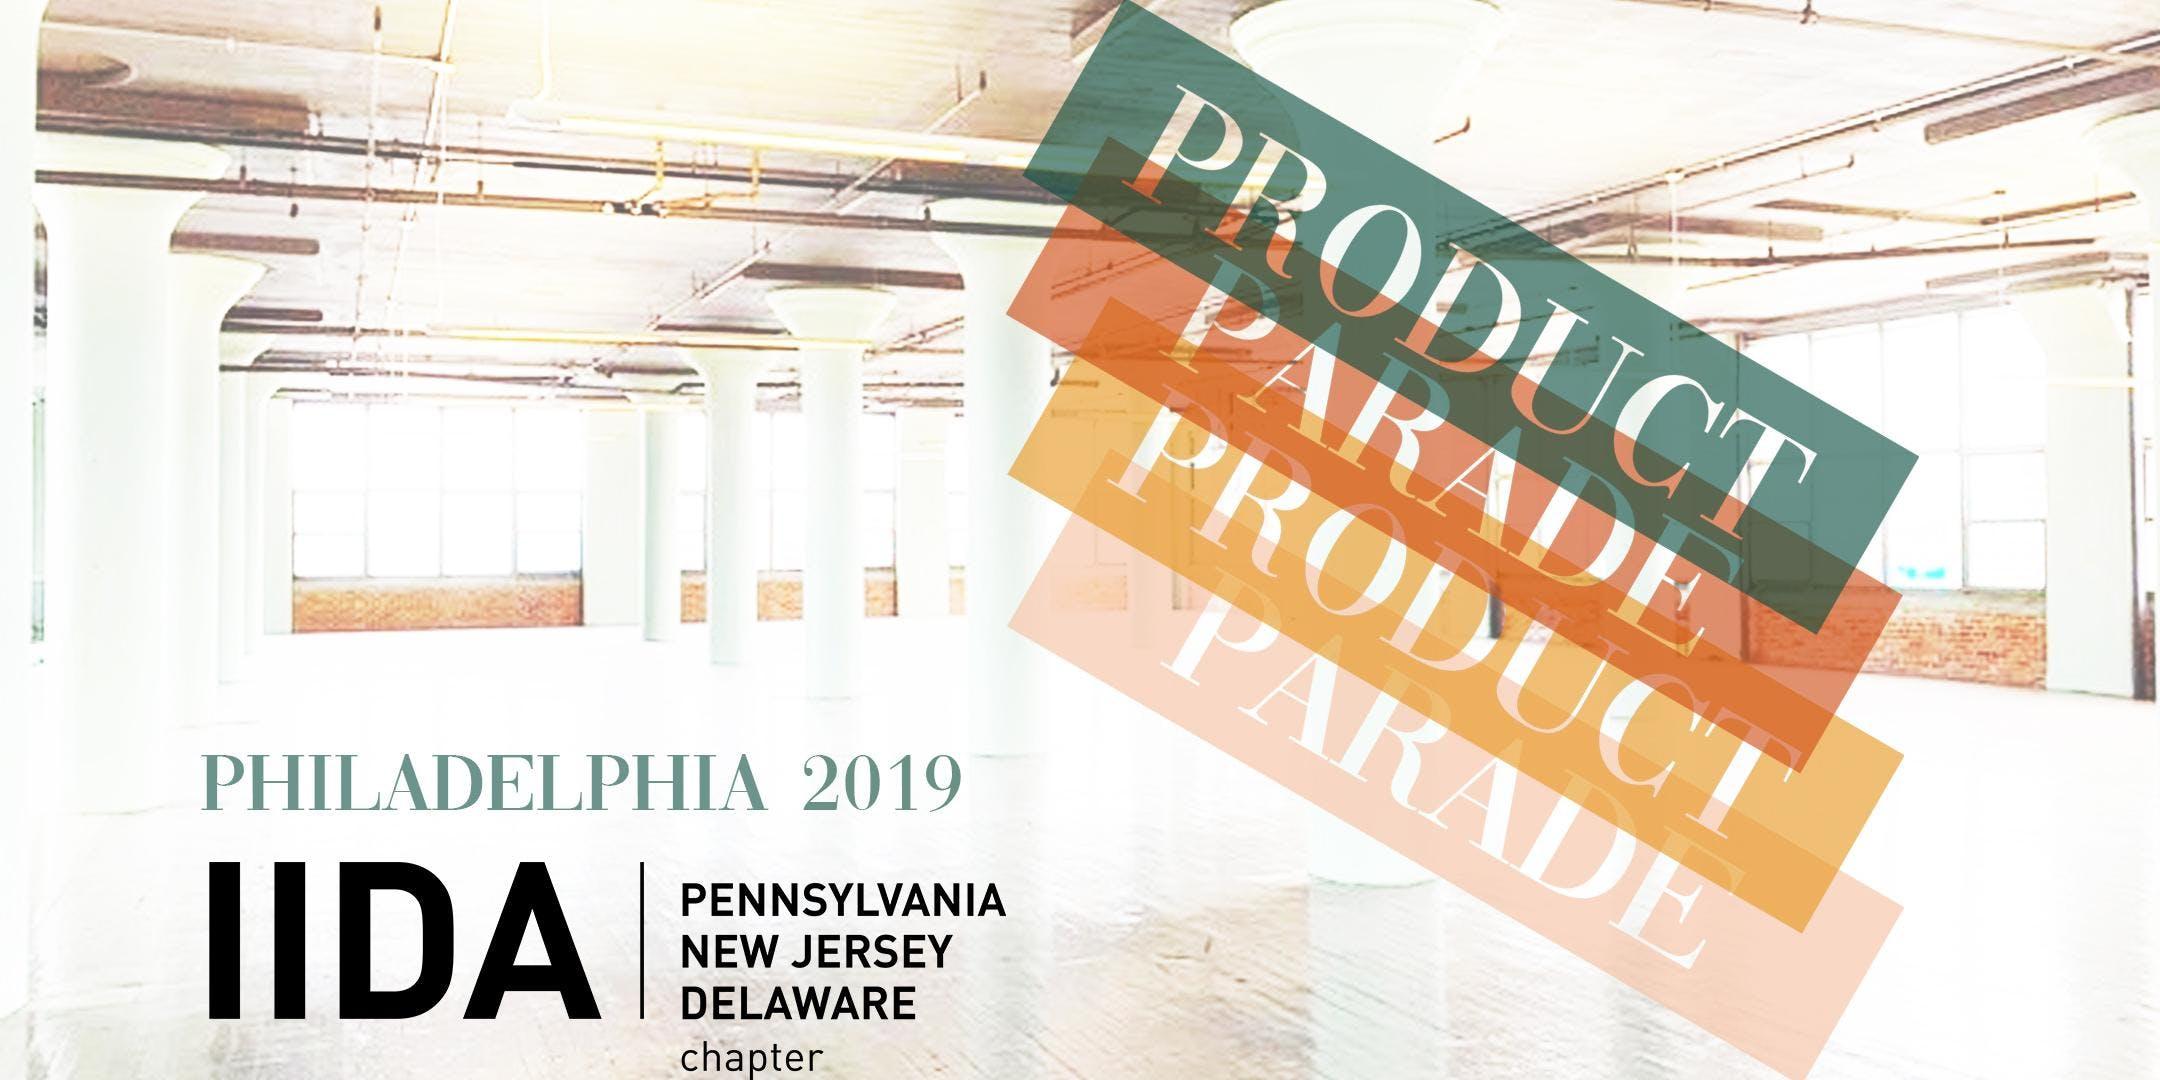 2019 Philadelphia Product Parade GENERAL ADMISSION